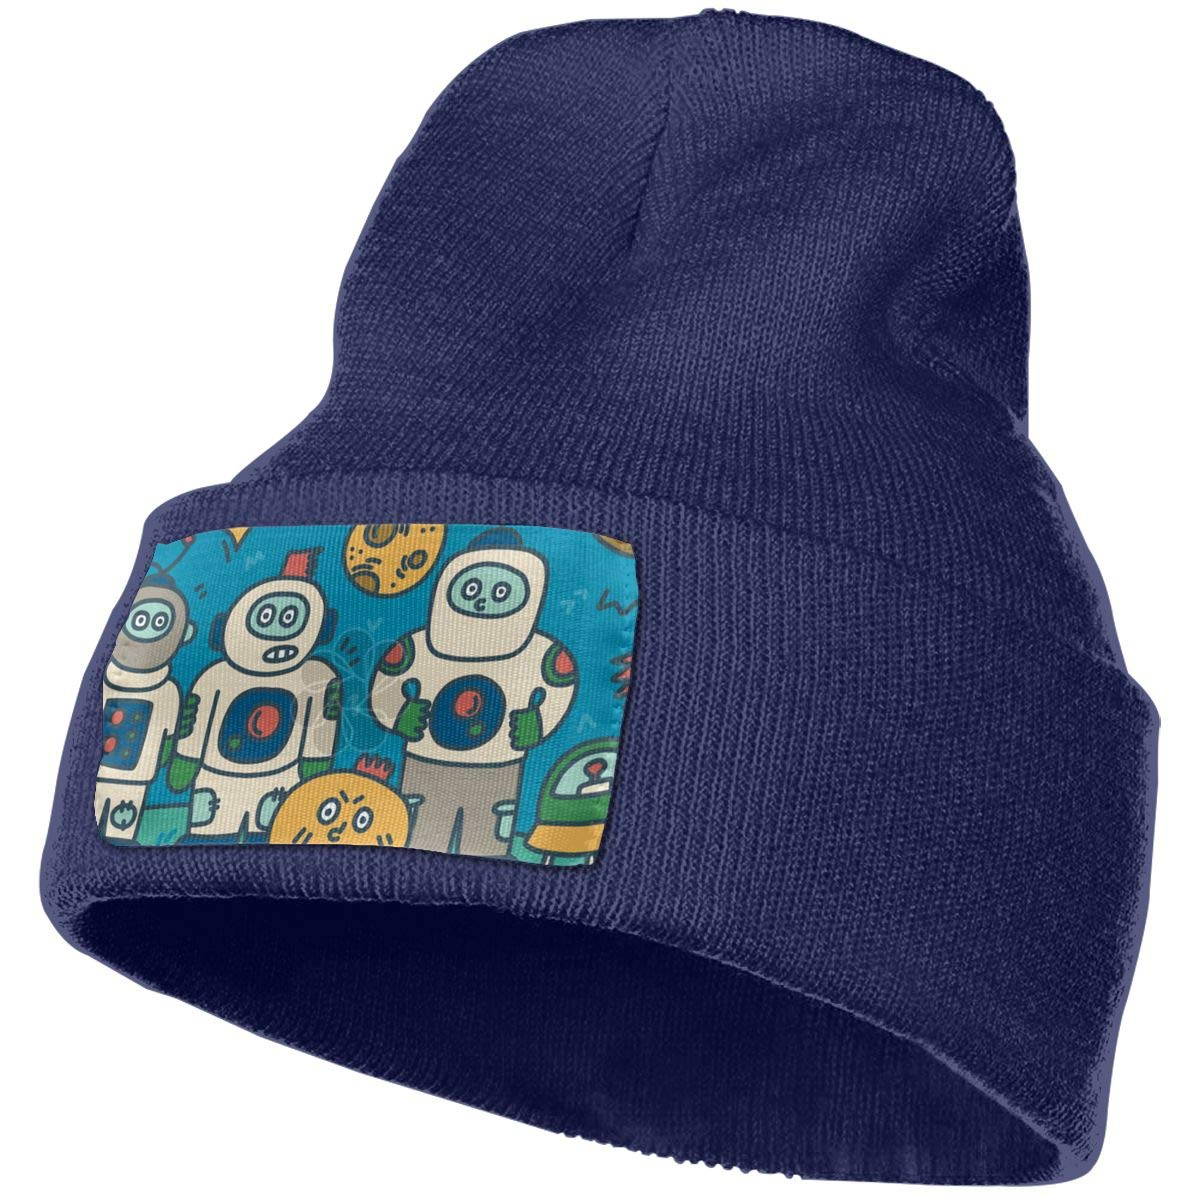 ONHIM Cartoon People Men /& Women Soft Warm Knit Beanie Hat Skull Ski Cap